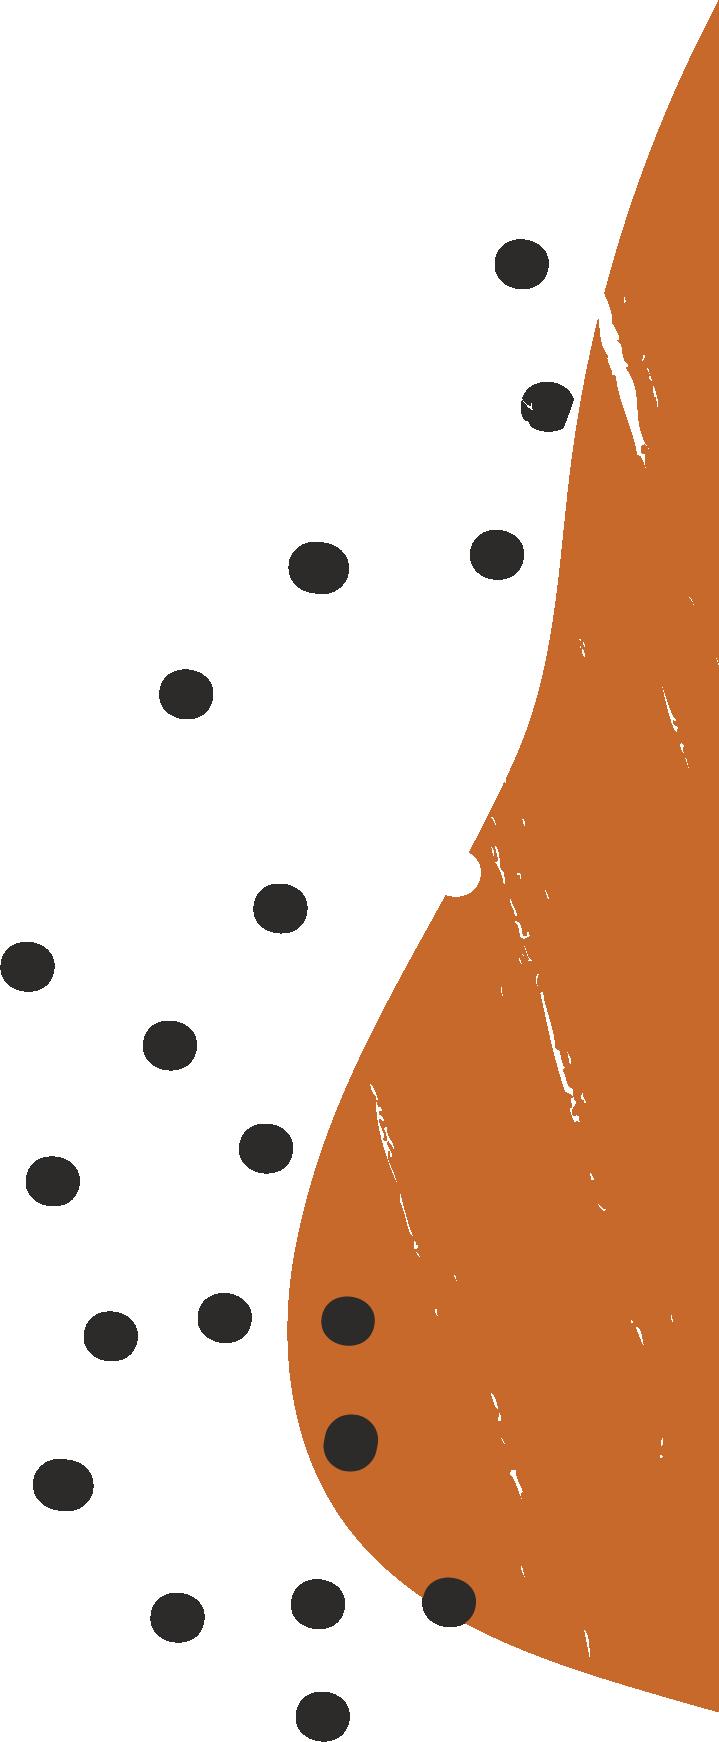 black dots and orange paint